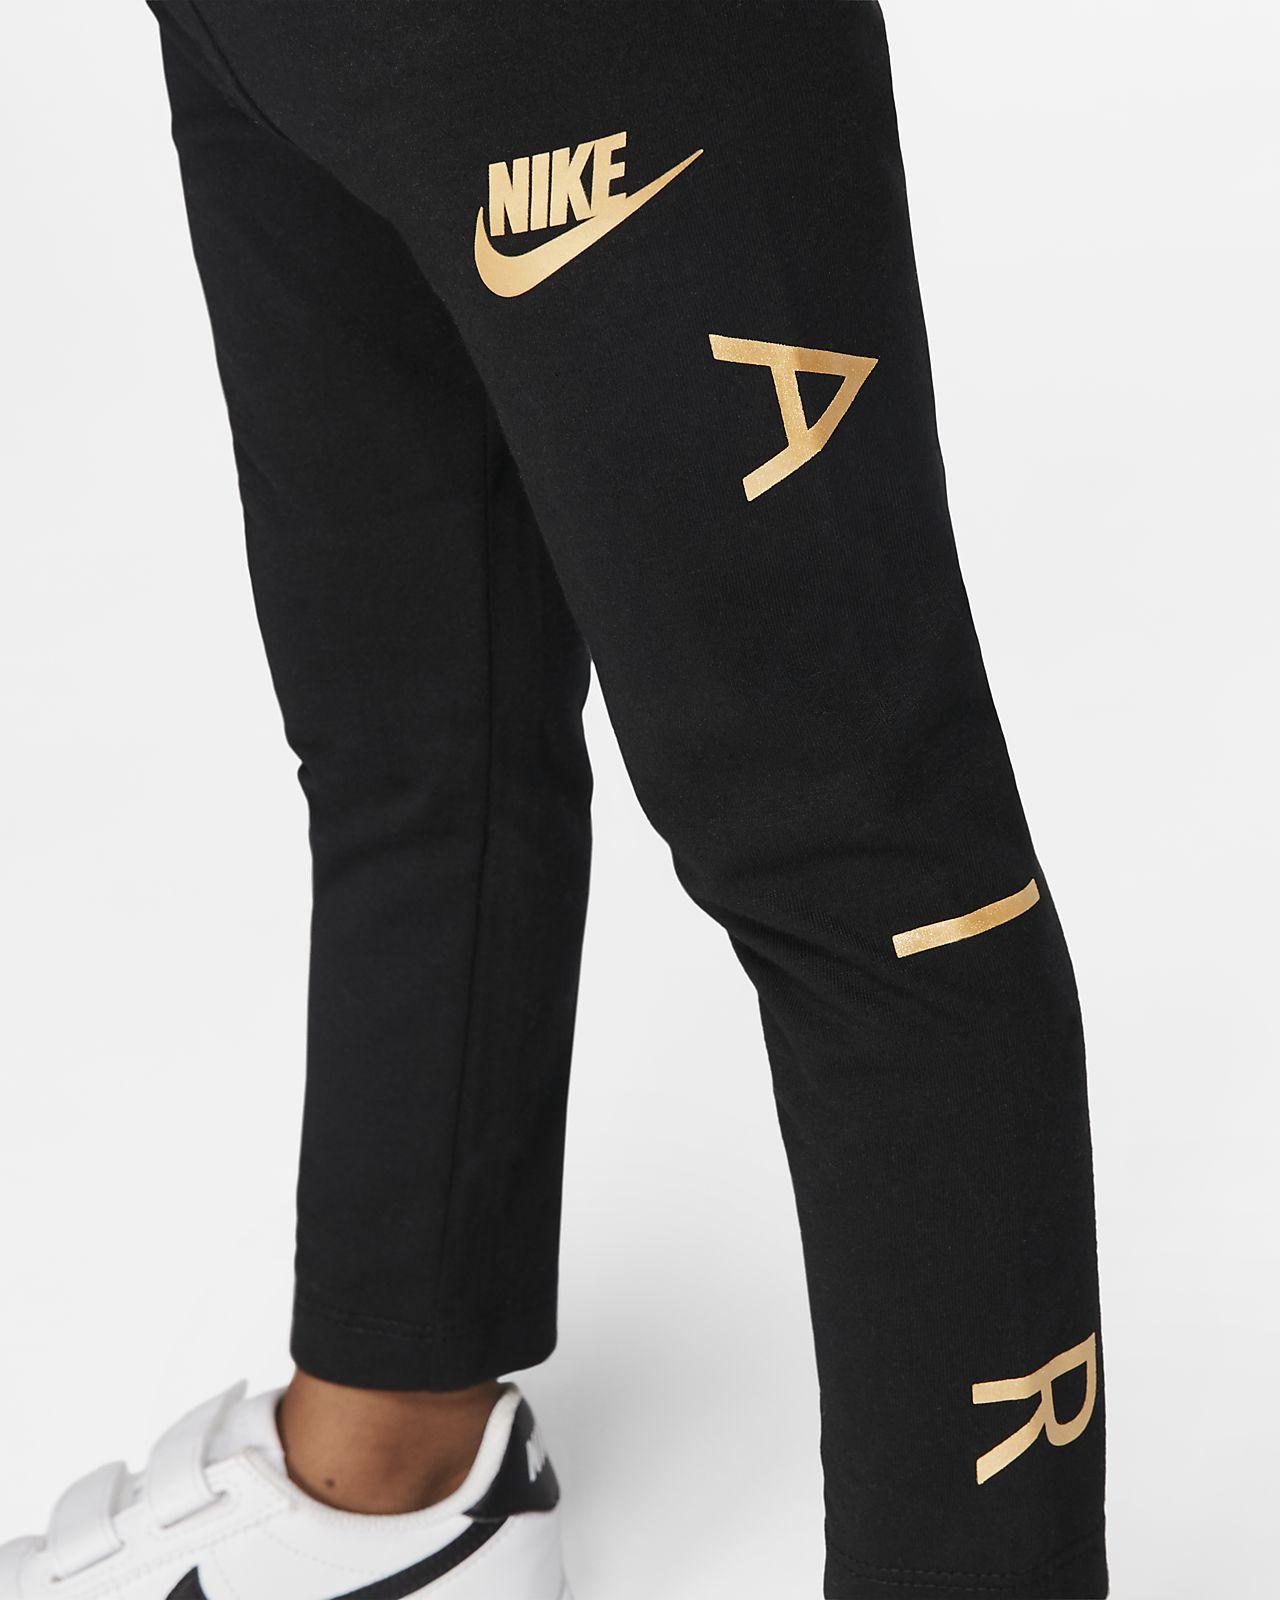 designer fashion wholesale speical offer ensemble legging nike